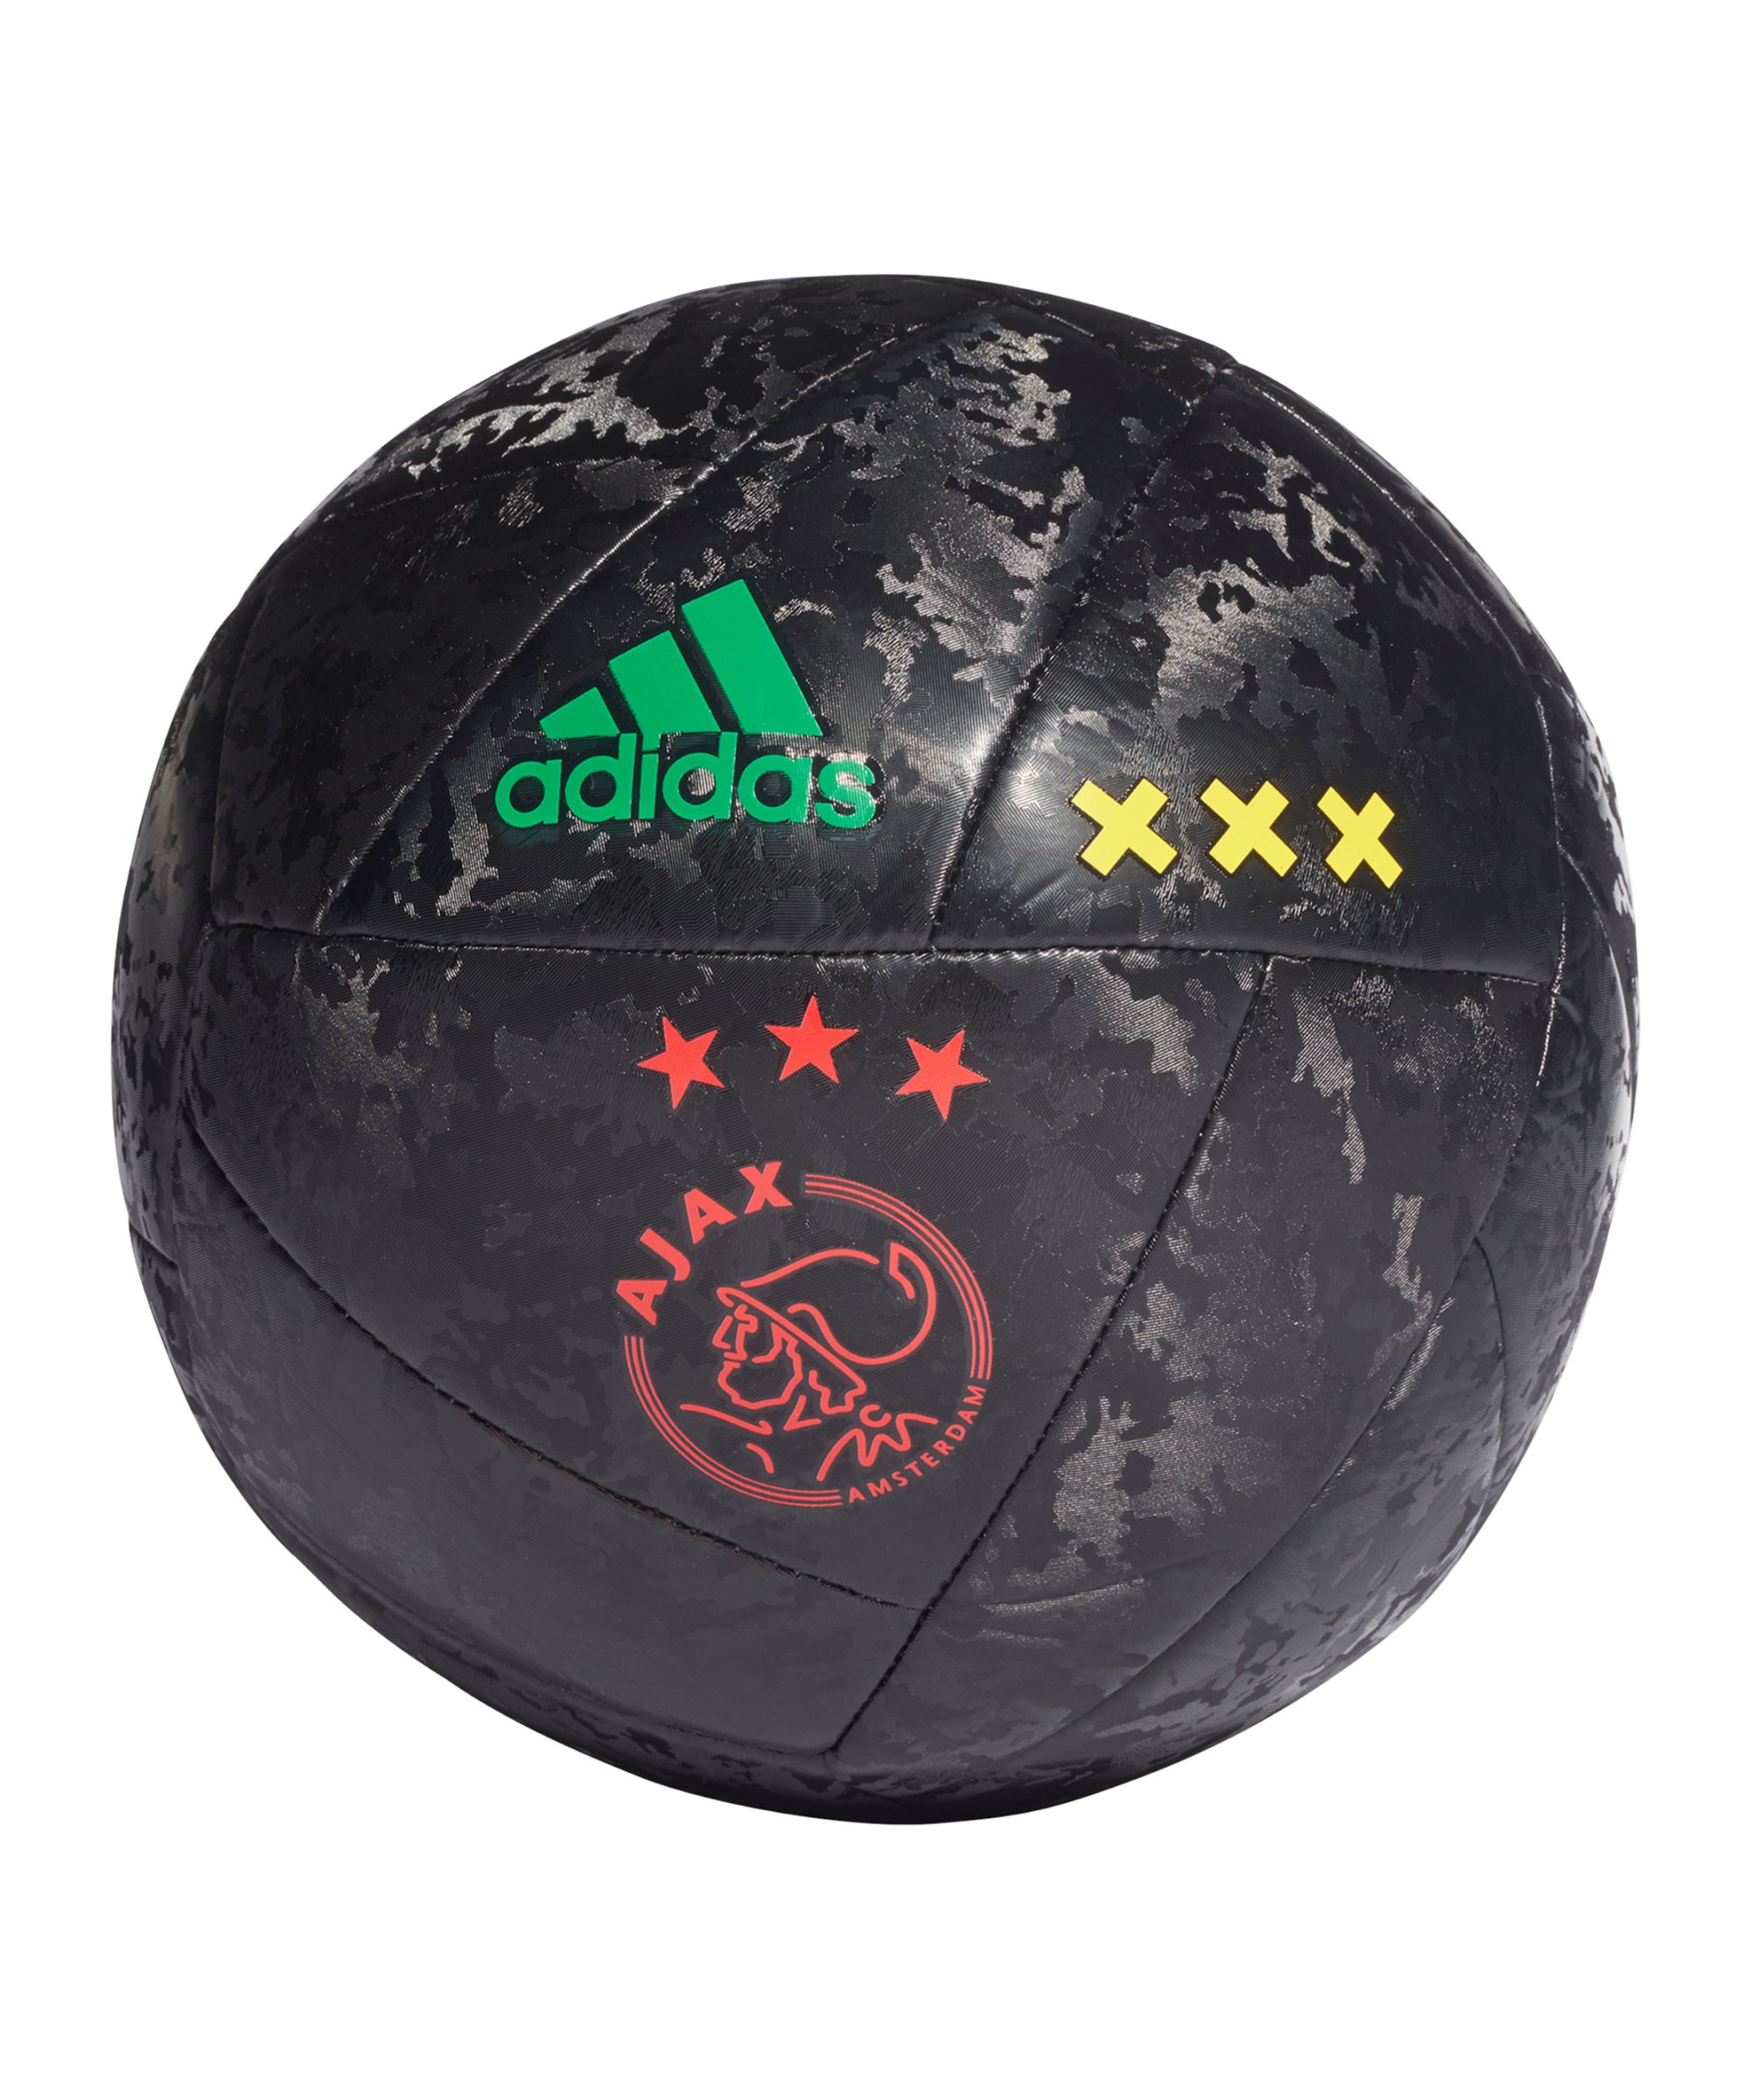 adidas Ajax Amsterdam CL Fussball Schwarz Rot - schwarz